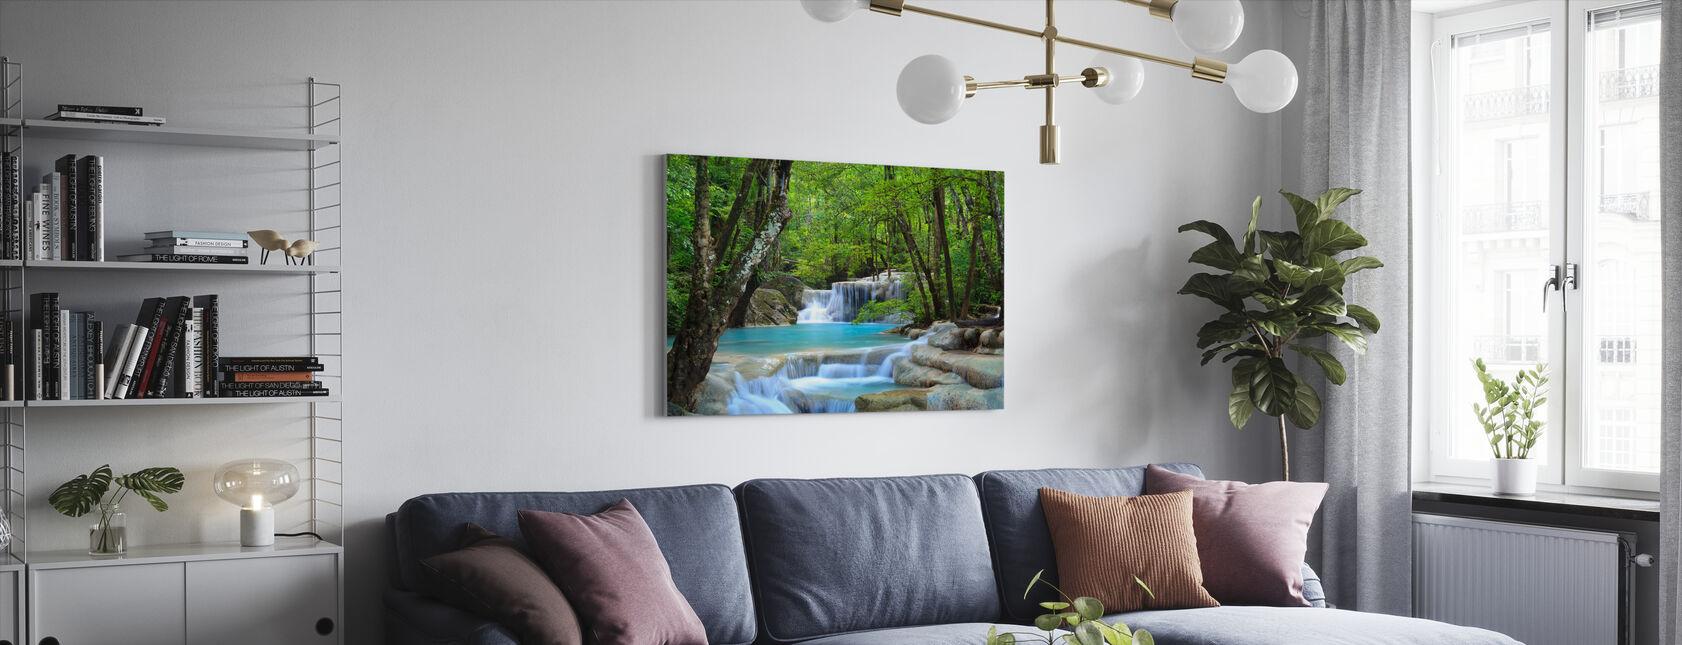 Erawan vesiputous Thaimaa - Canvastaulu - Olohuone